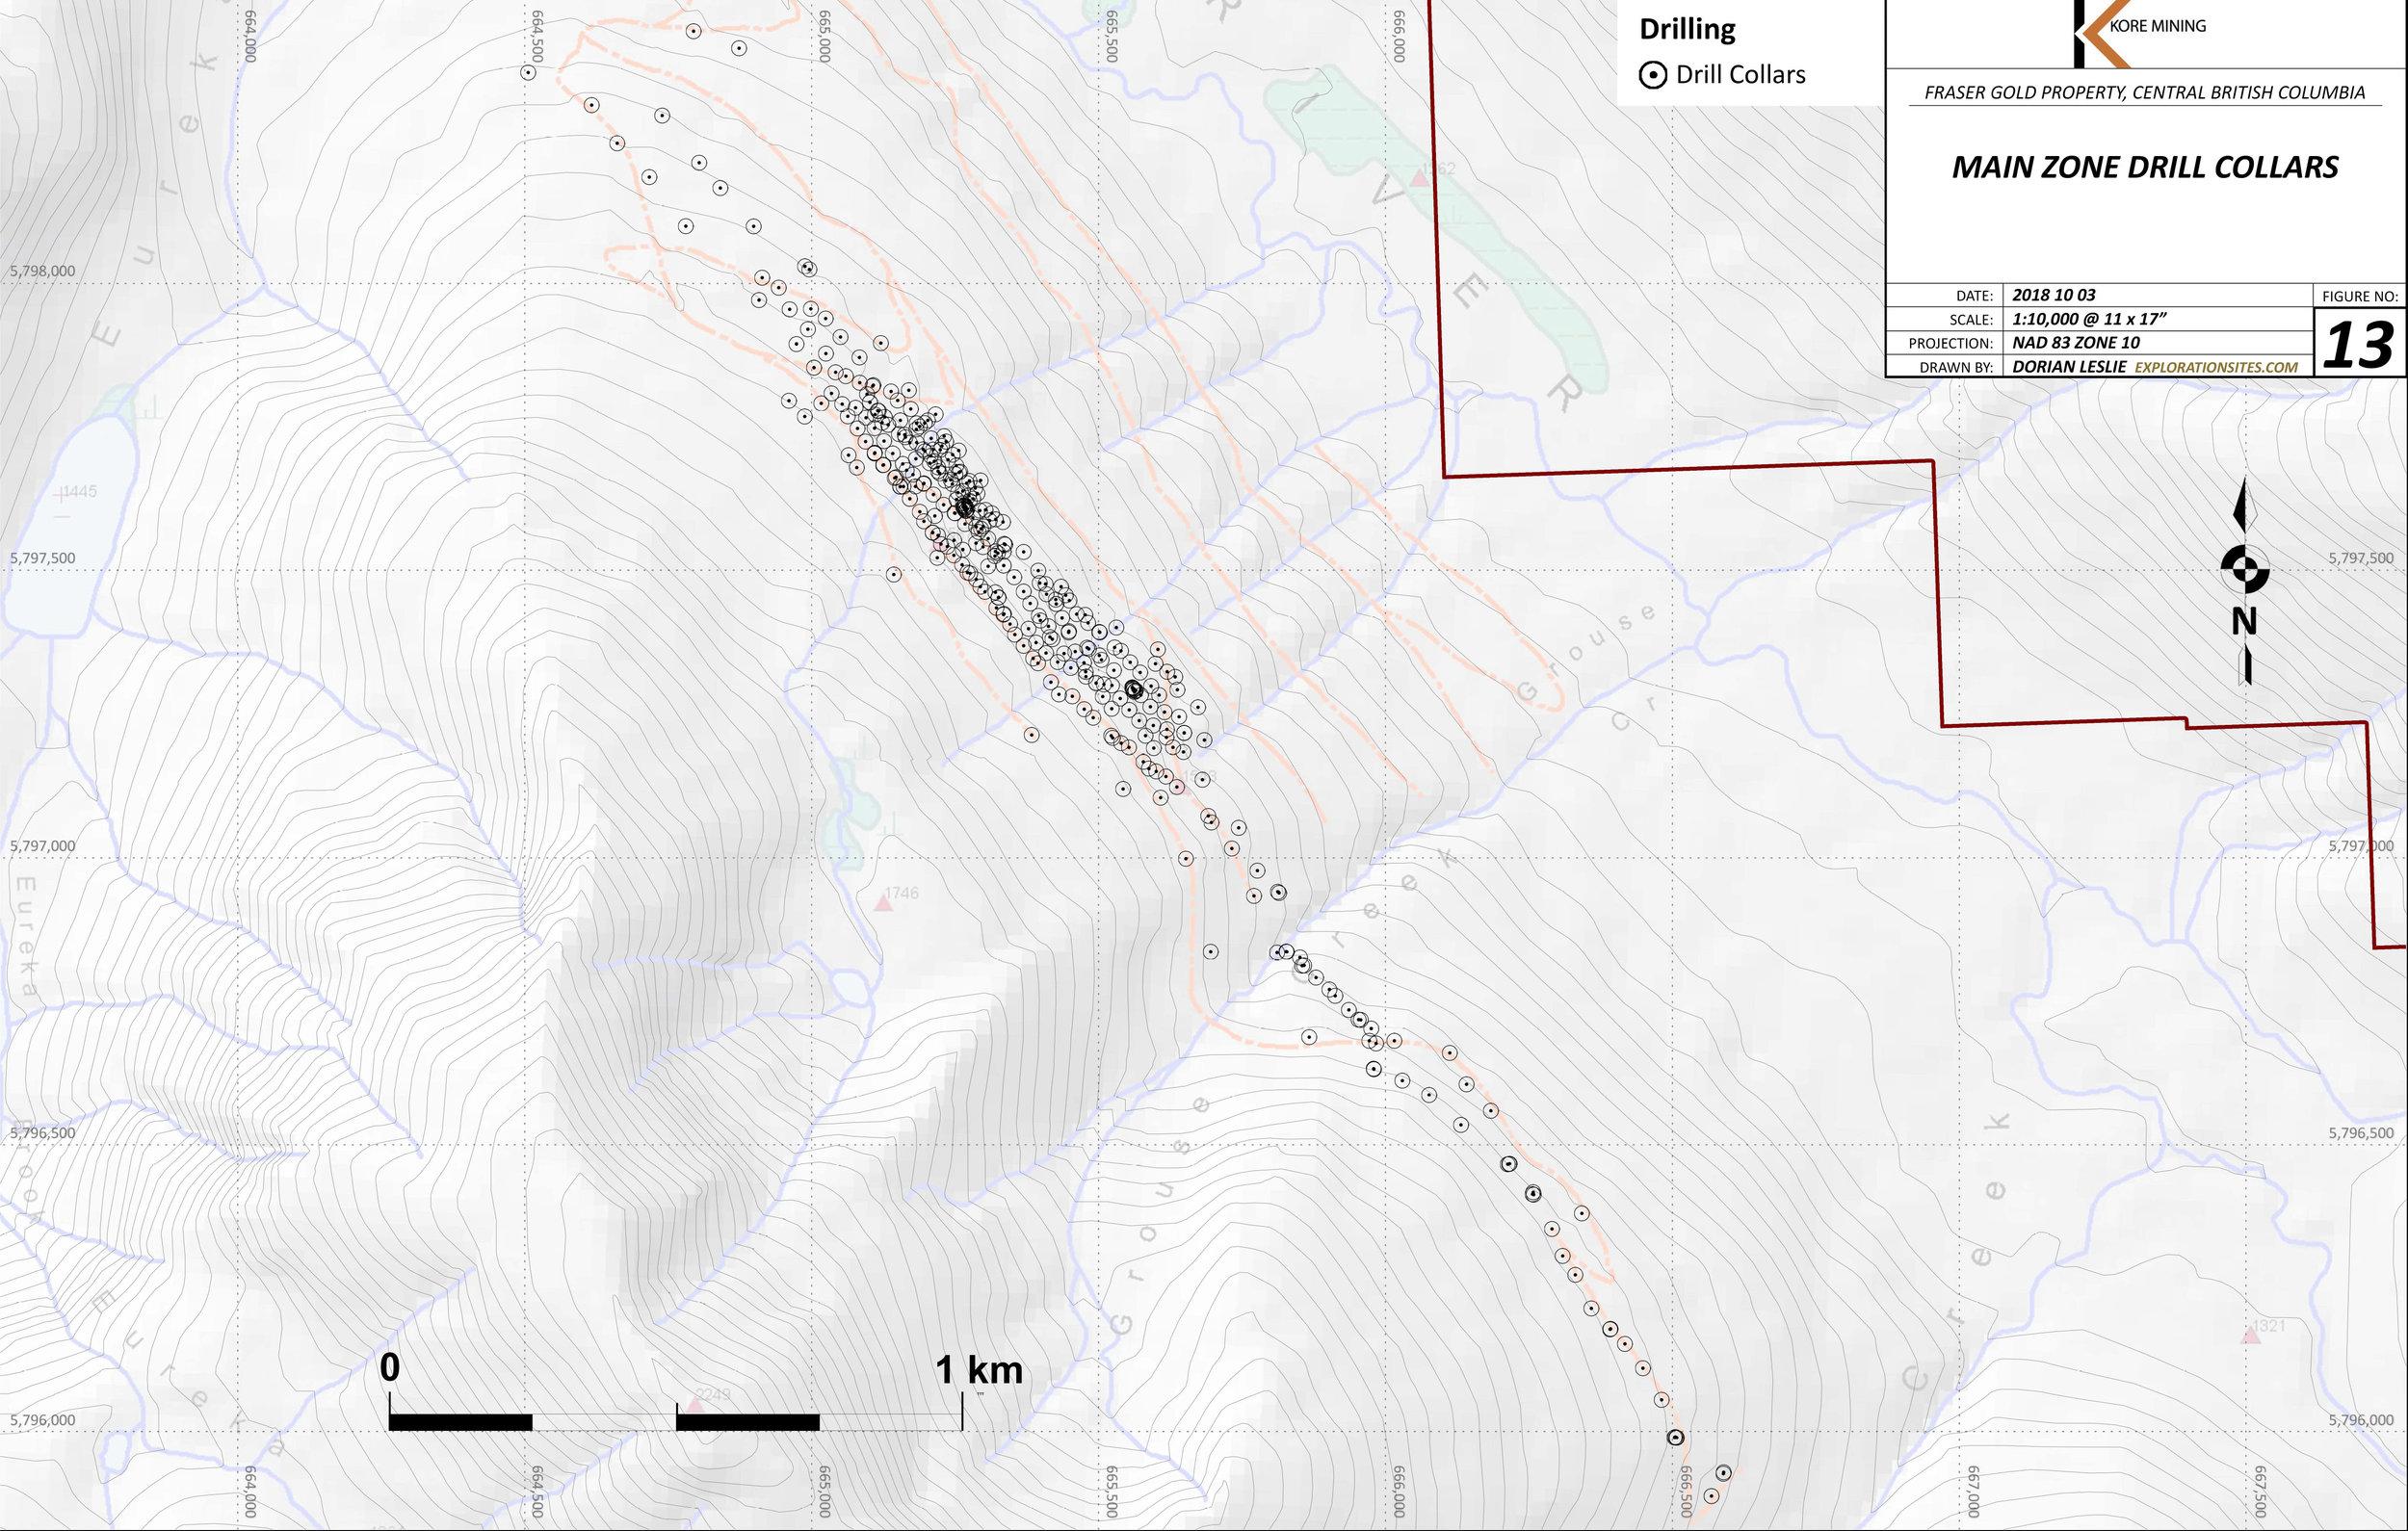 Historic Drilling 1983-1993, 2007-2008.